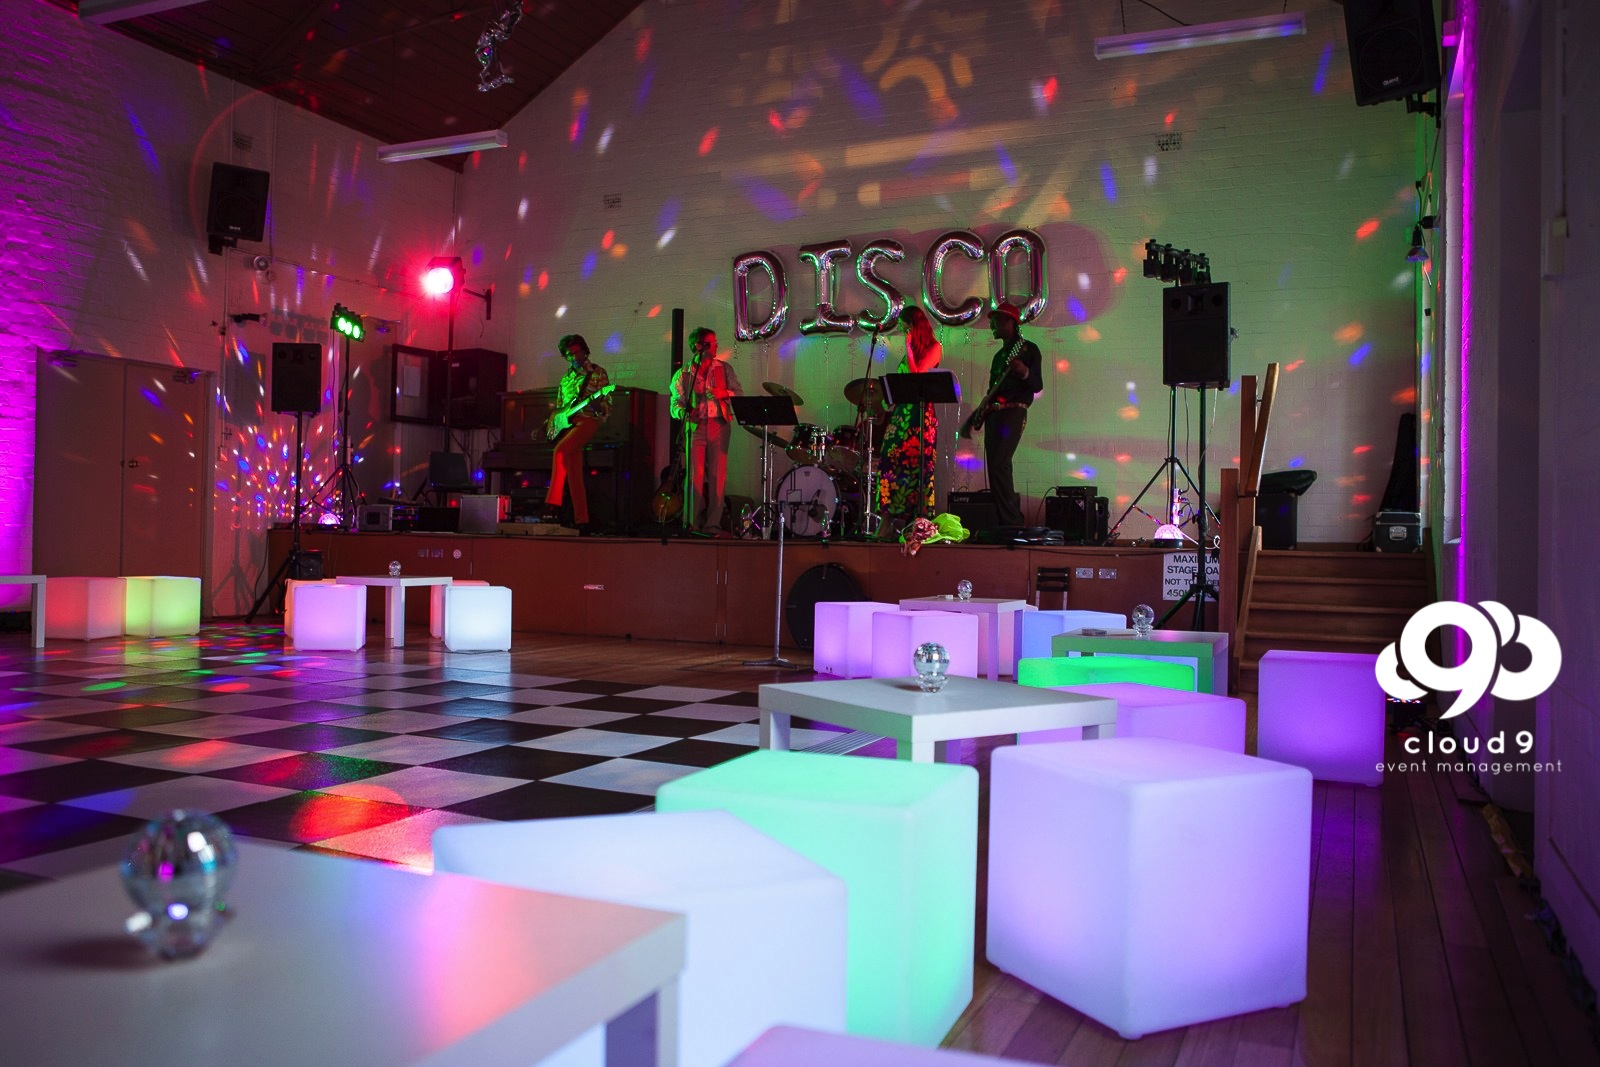 Disco_Themed_Event_Sydney